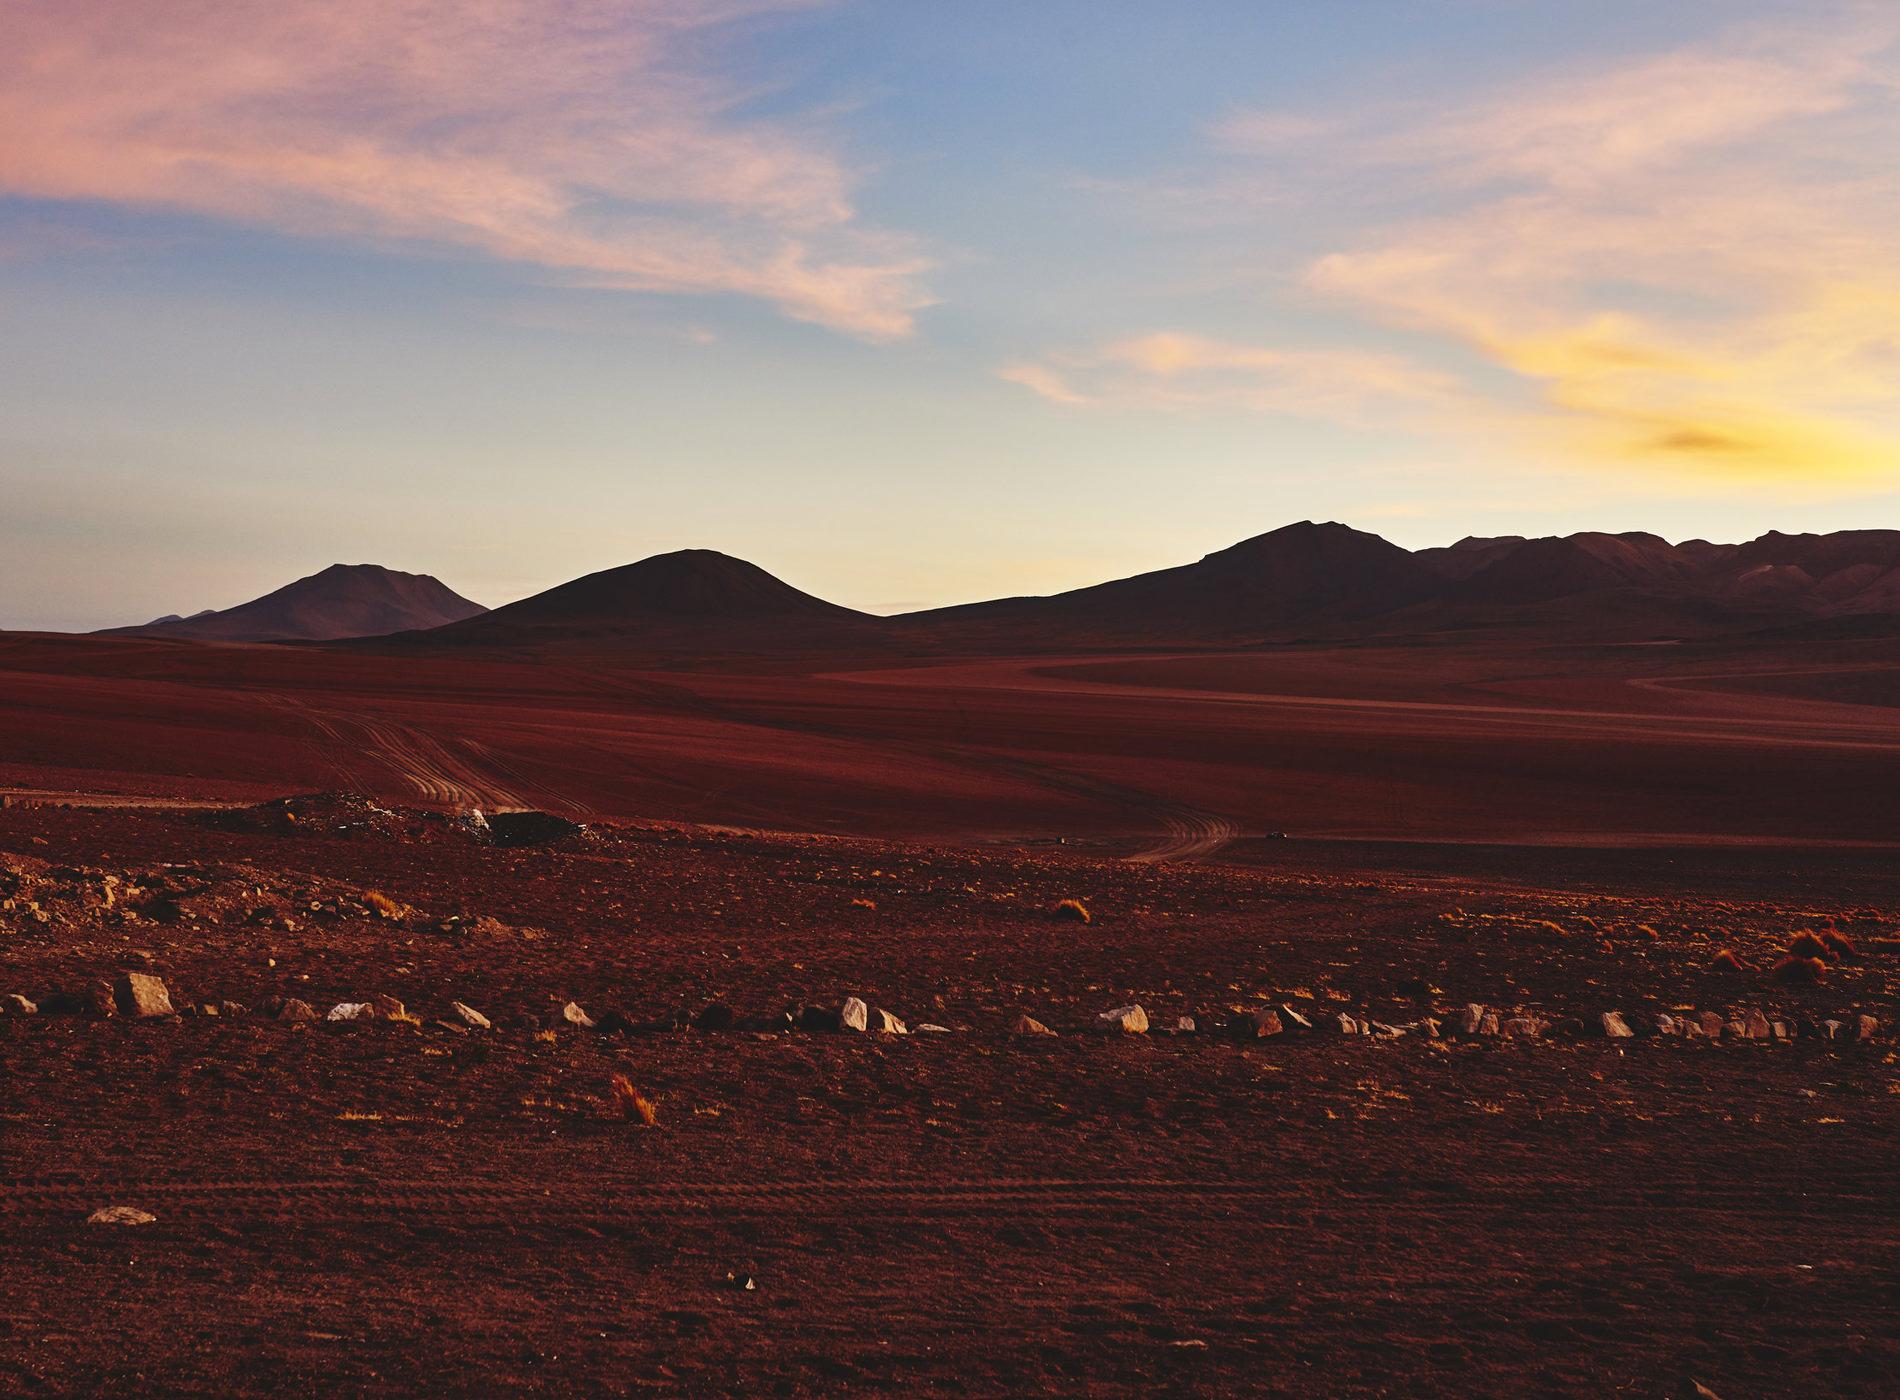 Adrian Gaut Photographie Bolivie Salar De Uyuni